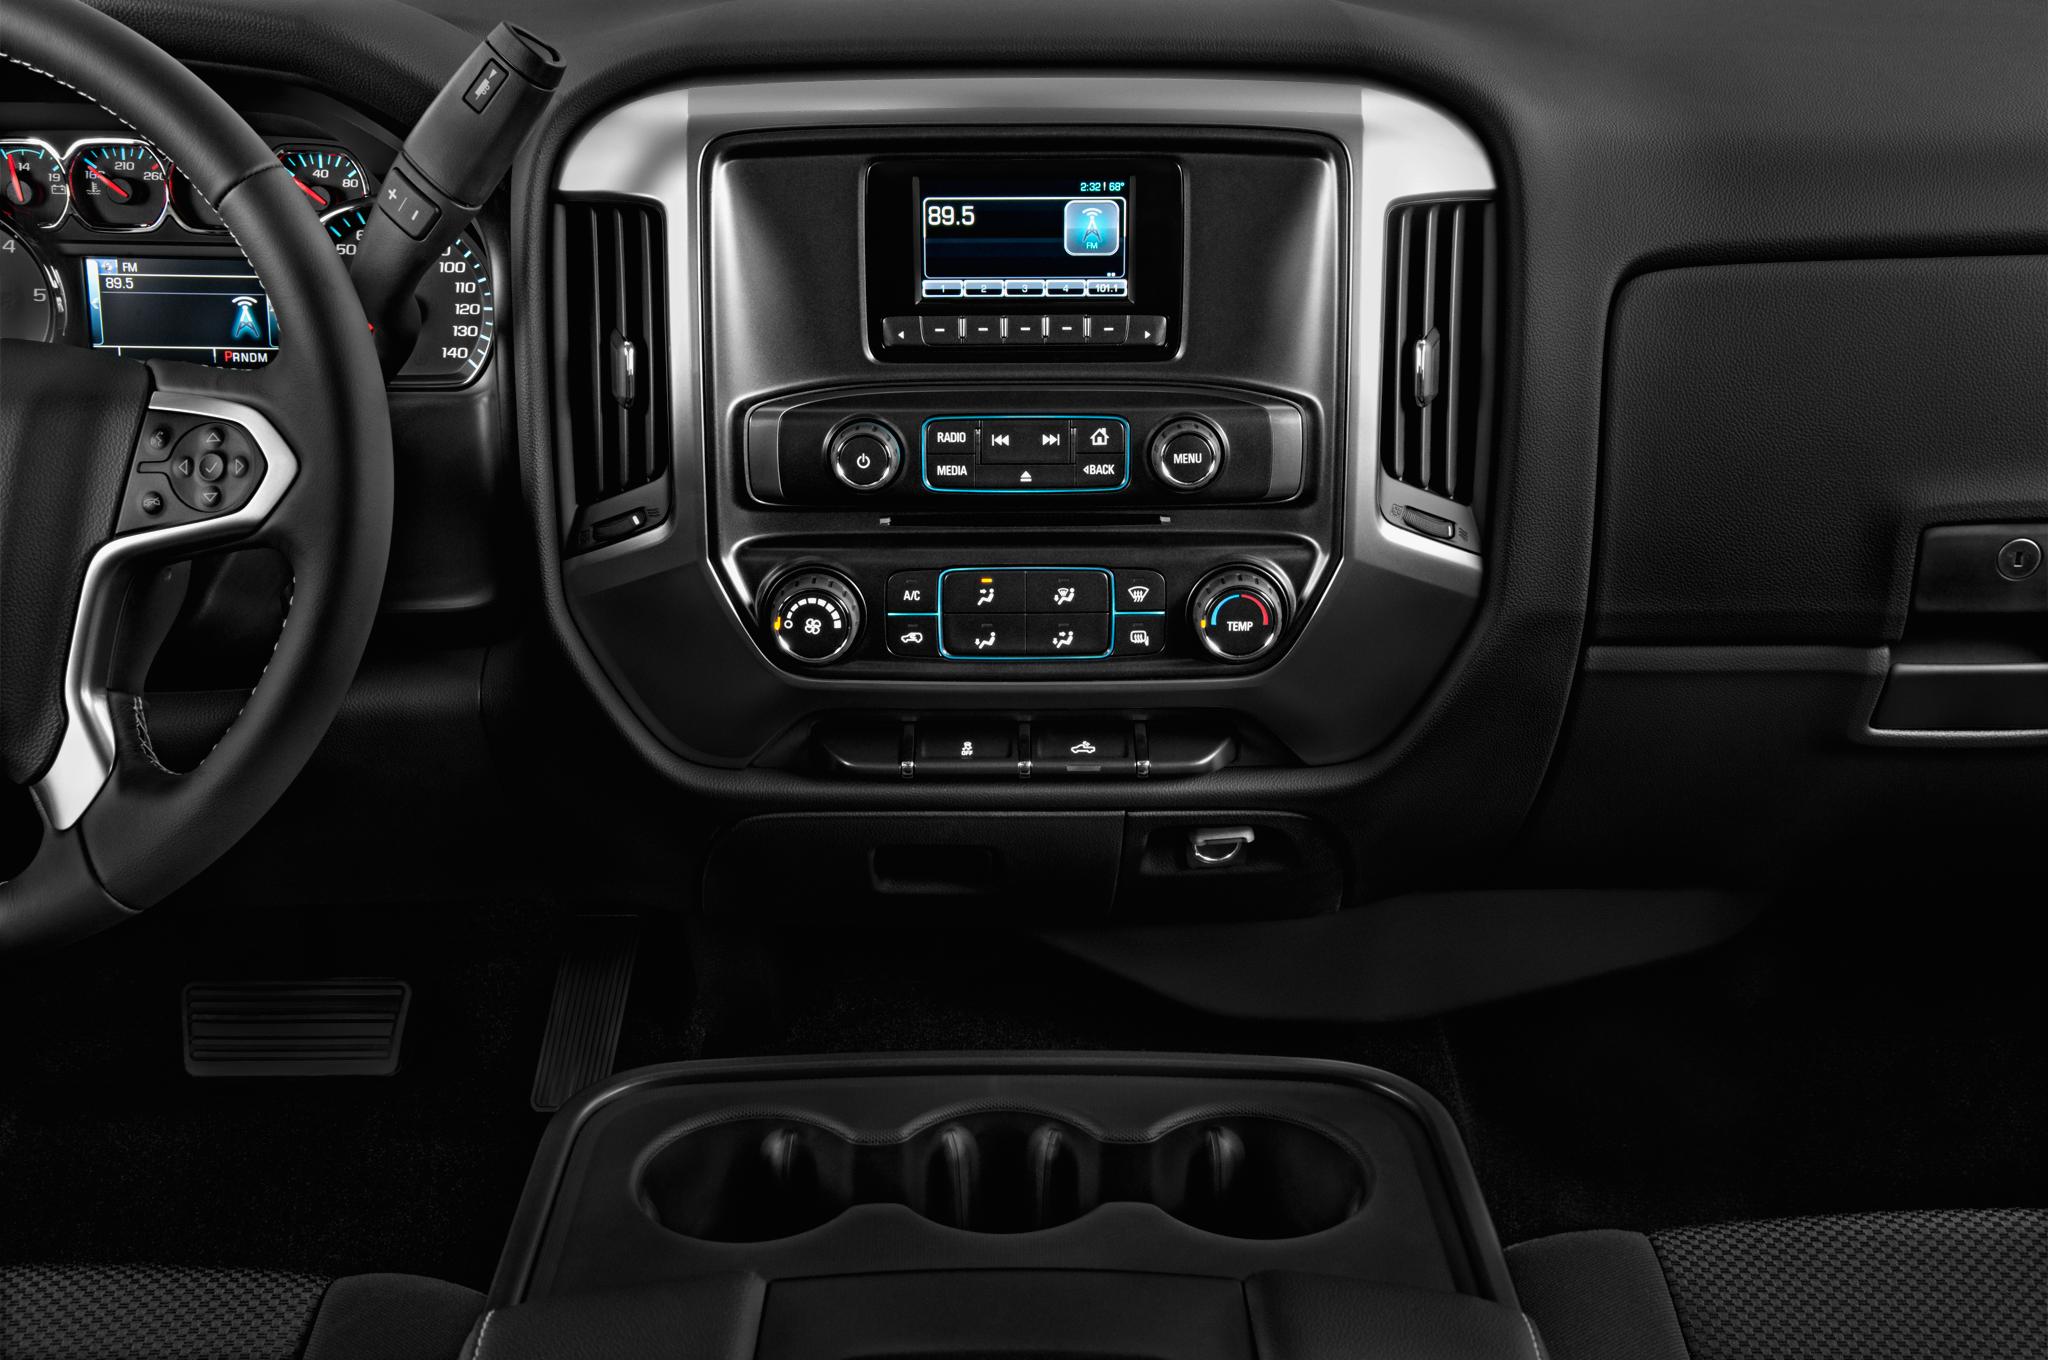 2016 chevrolet silverado gmc sierra add eassist hybrid automobile 83125 publicscrutiny Choice Image